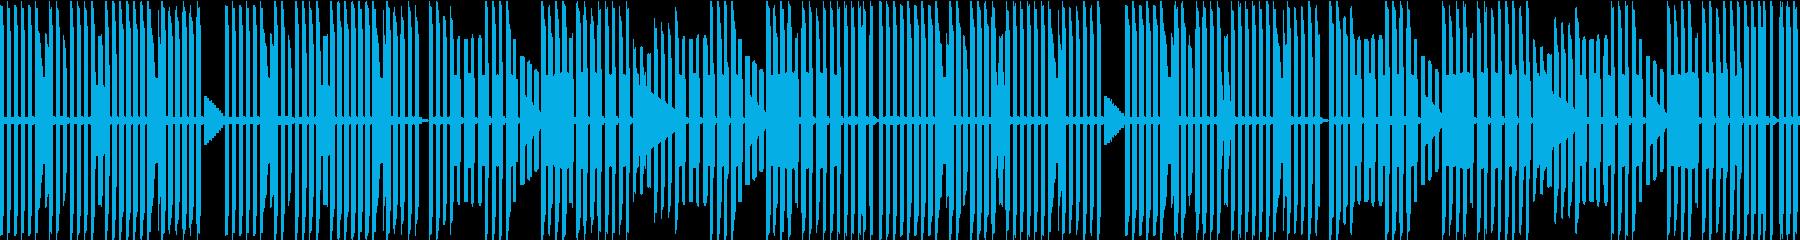 FC風ループ 選んで集めての再生済みの波形